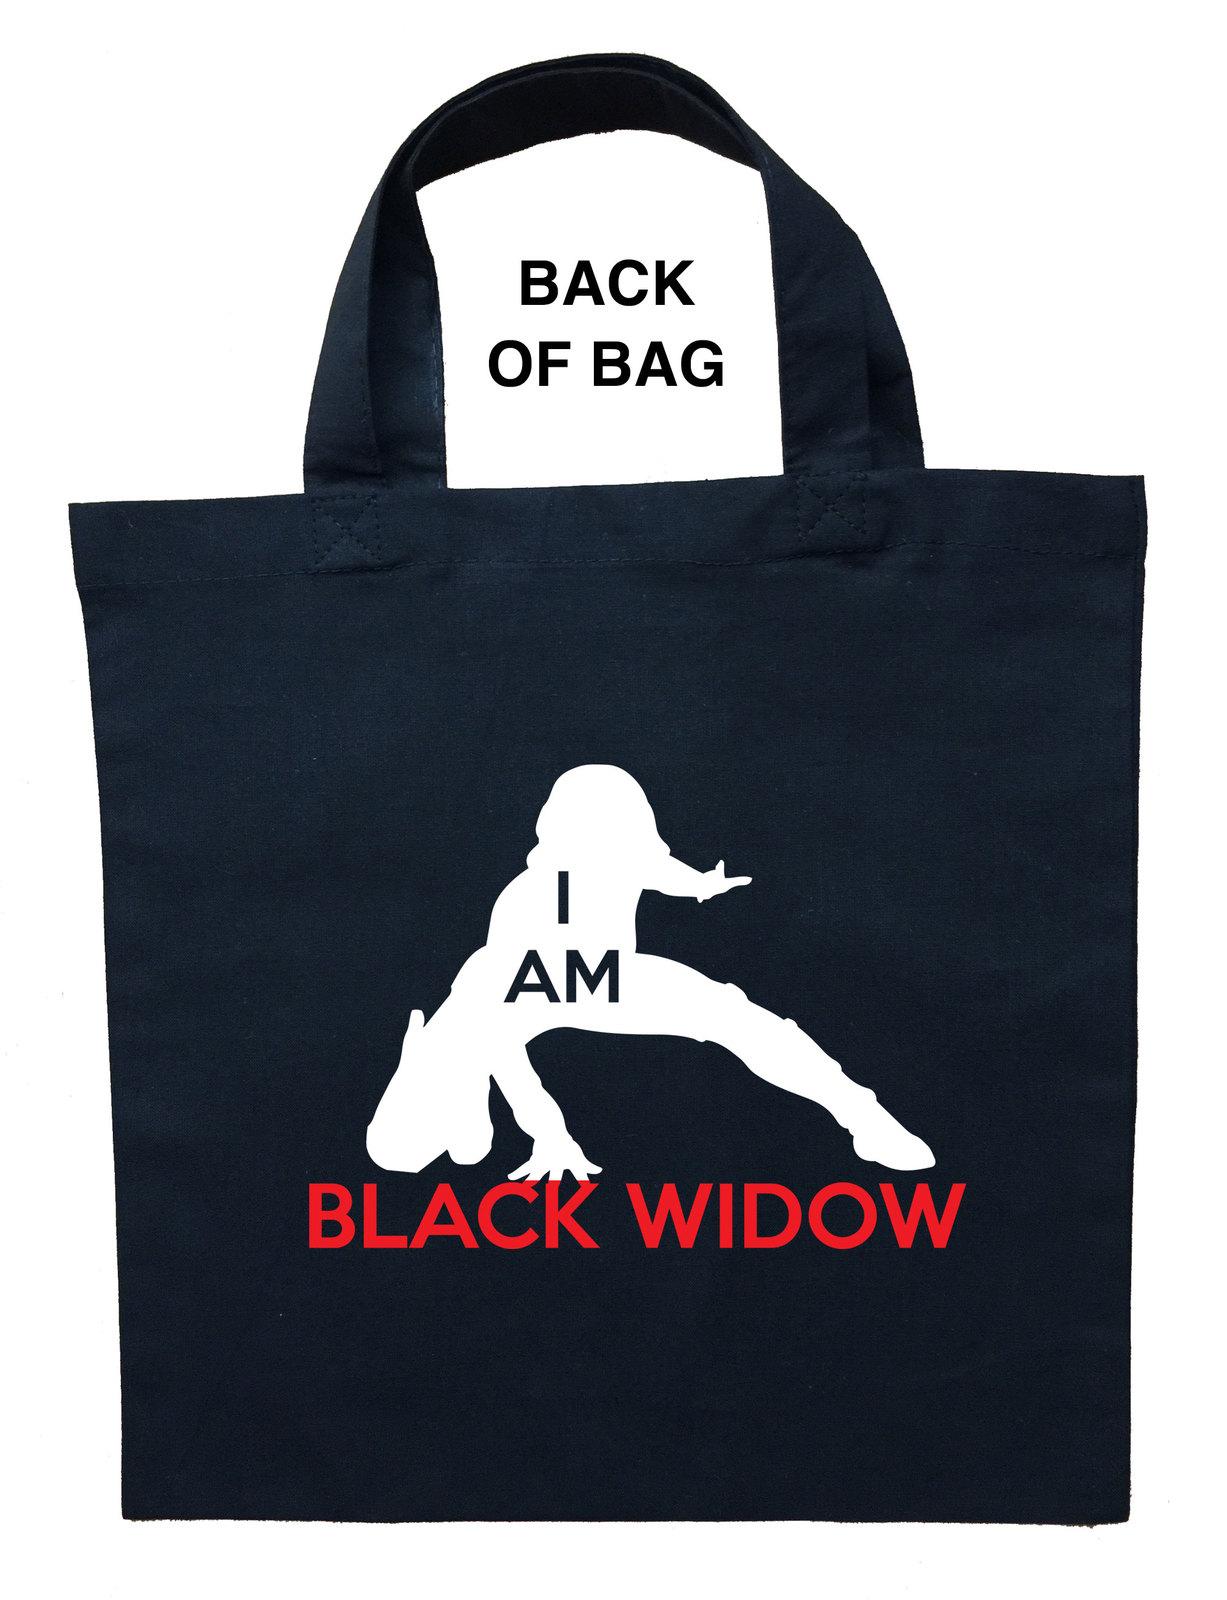 Black Widow Trick or Treat Bag, Custom Black Widow Halloween Loot Bag